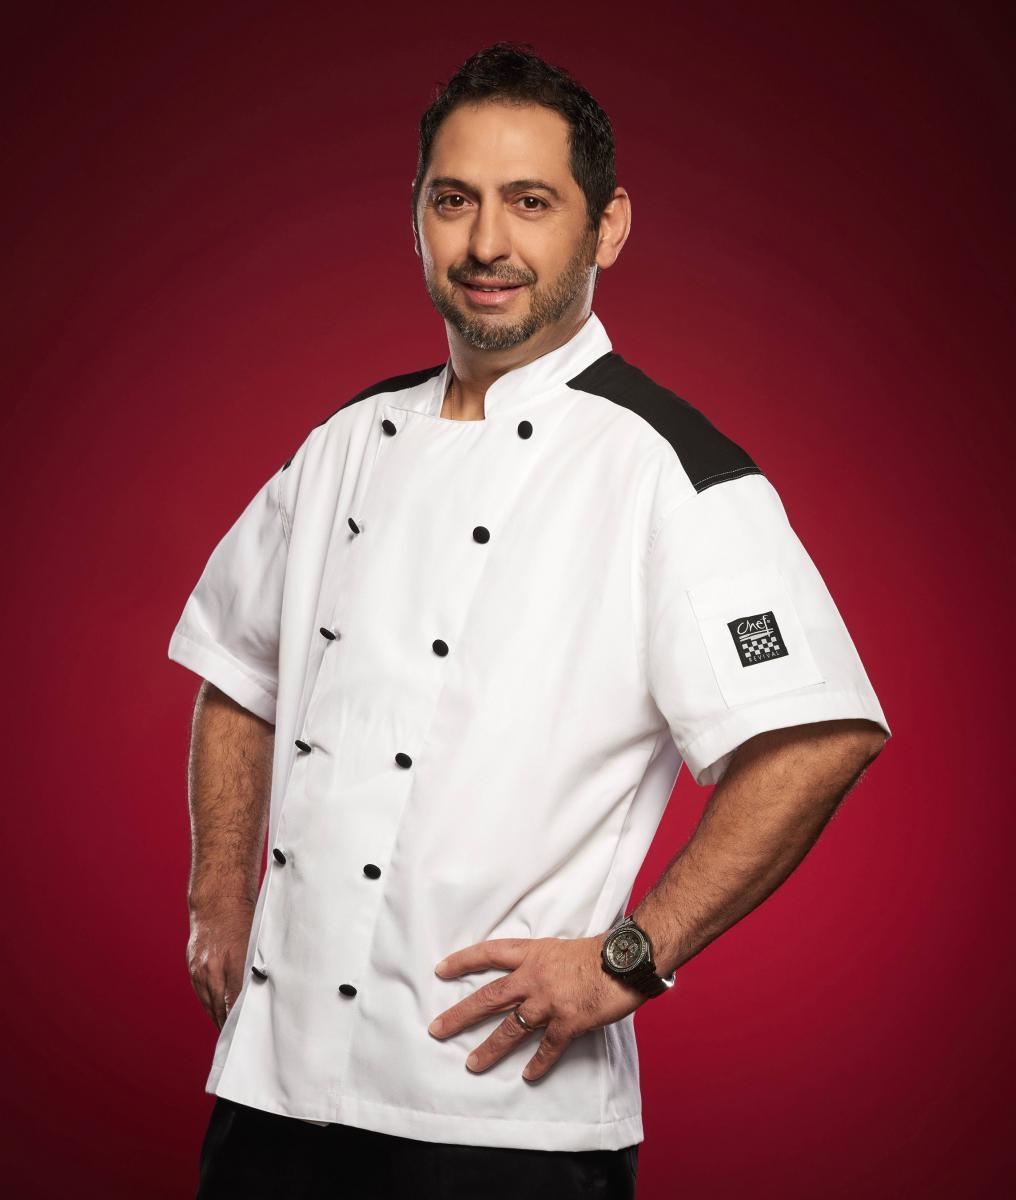 Giovanni Filippone Hells Kitchen Wiki Fandom